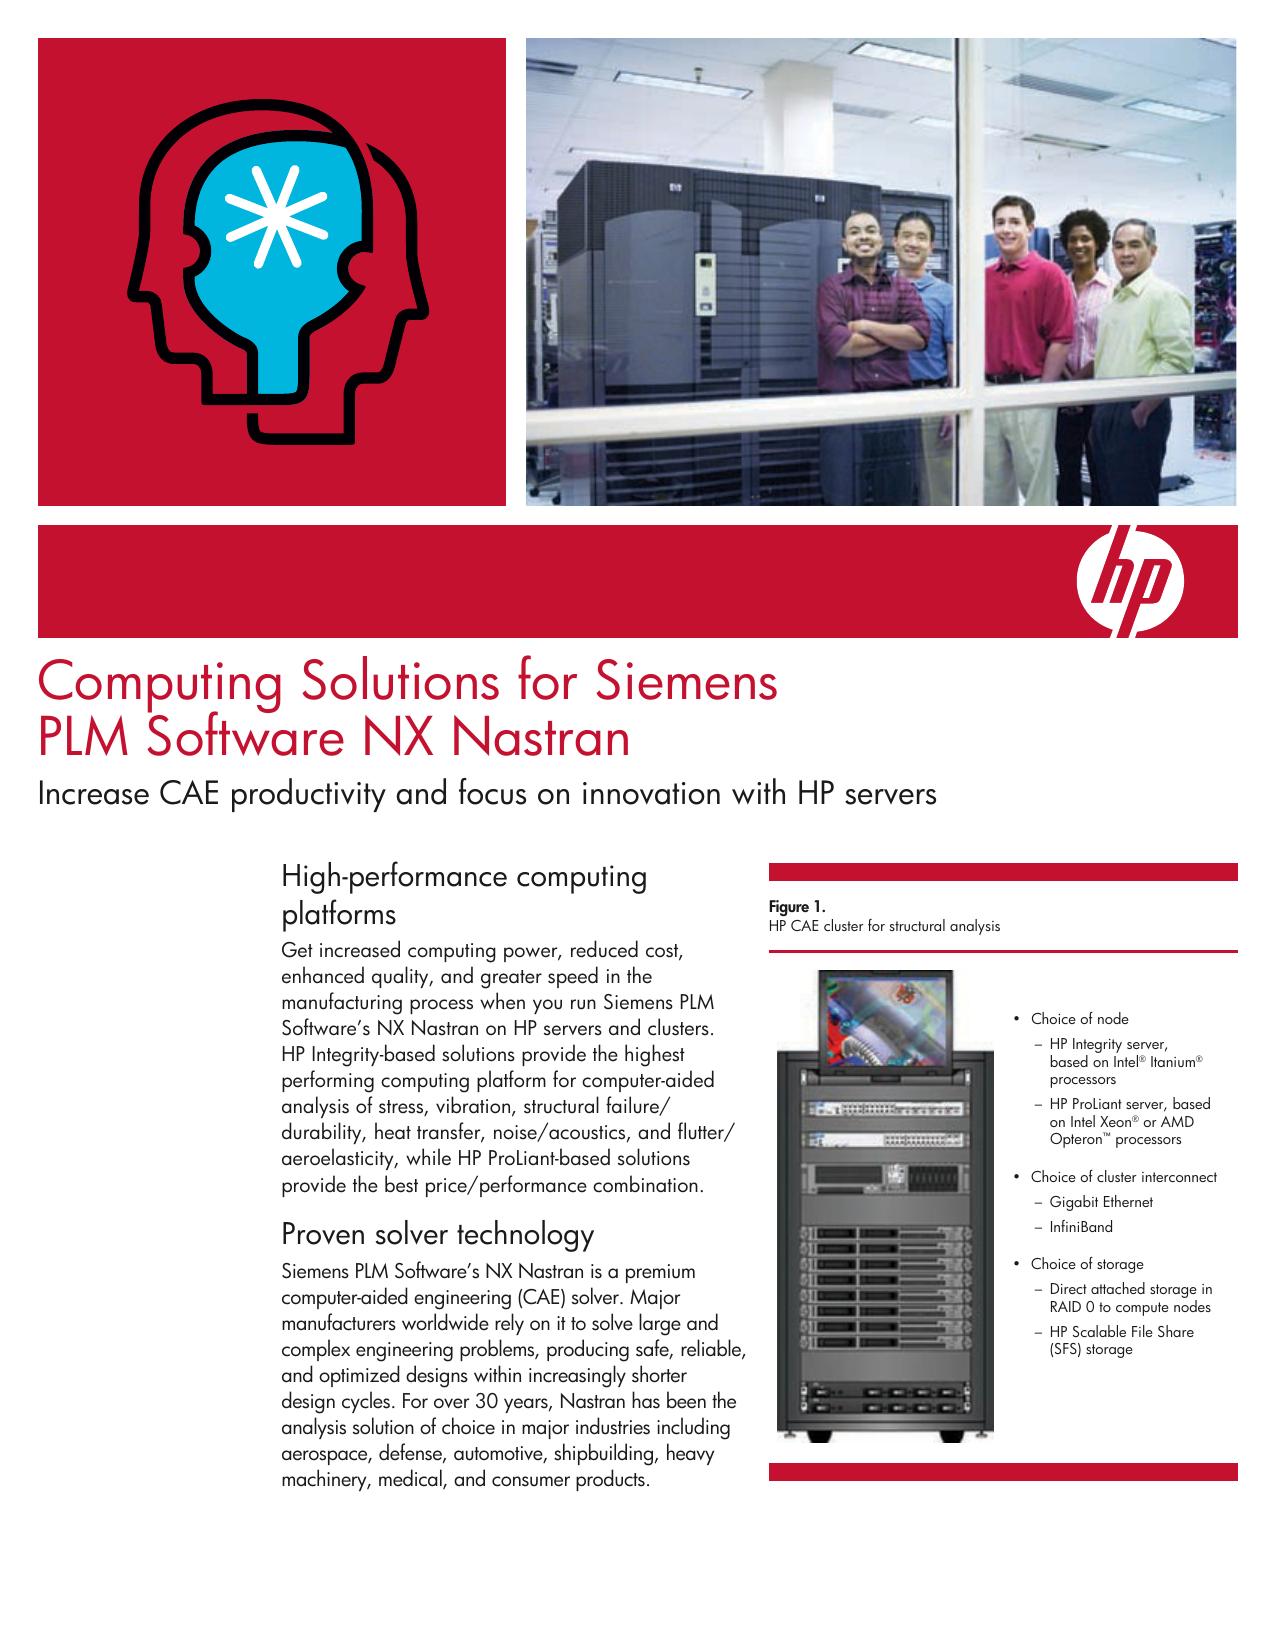 Computing Solutions for Siemens PLM Software NX Nastran